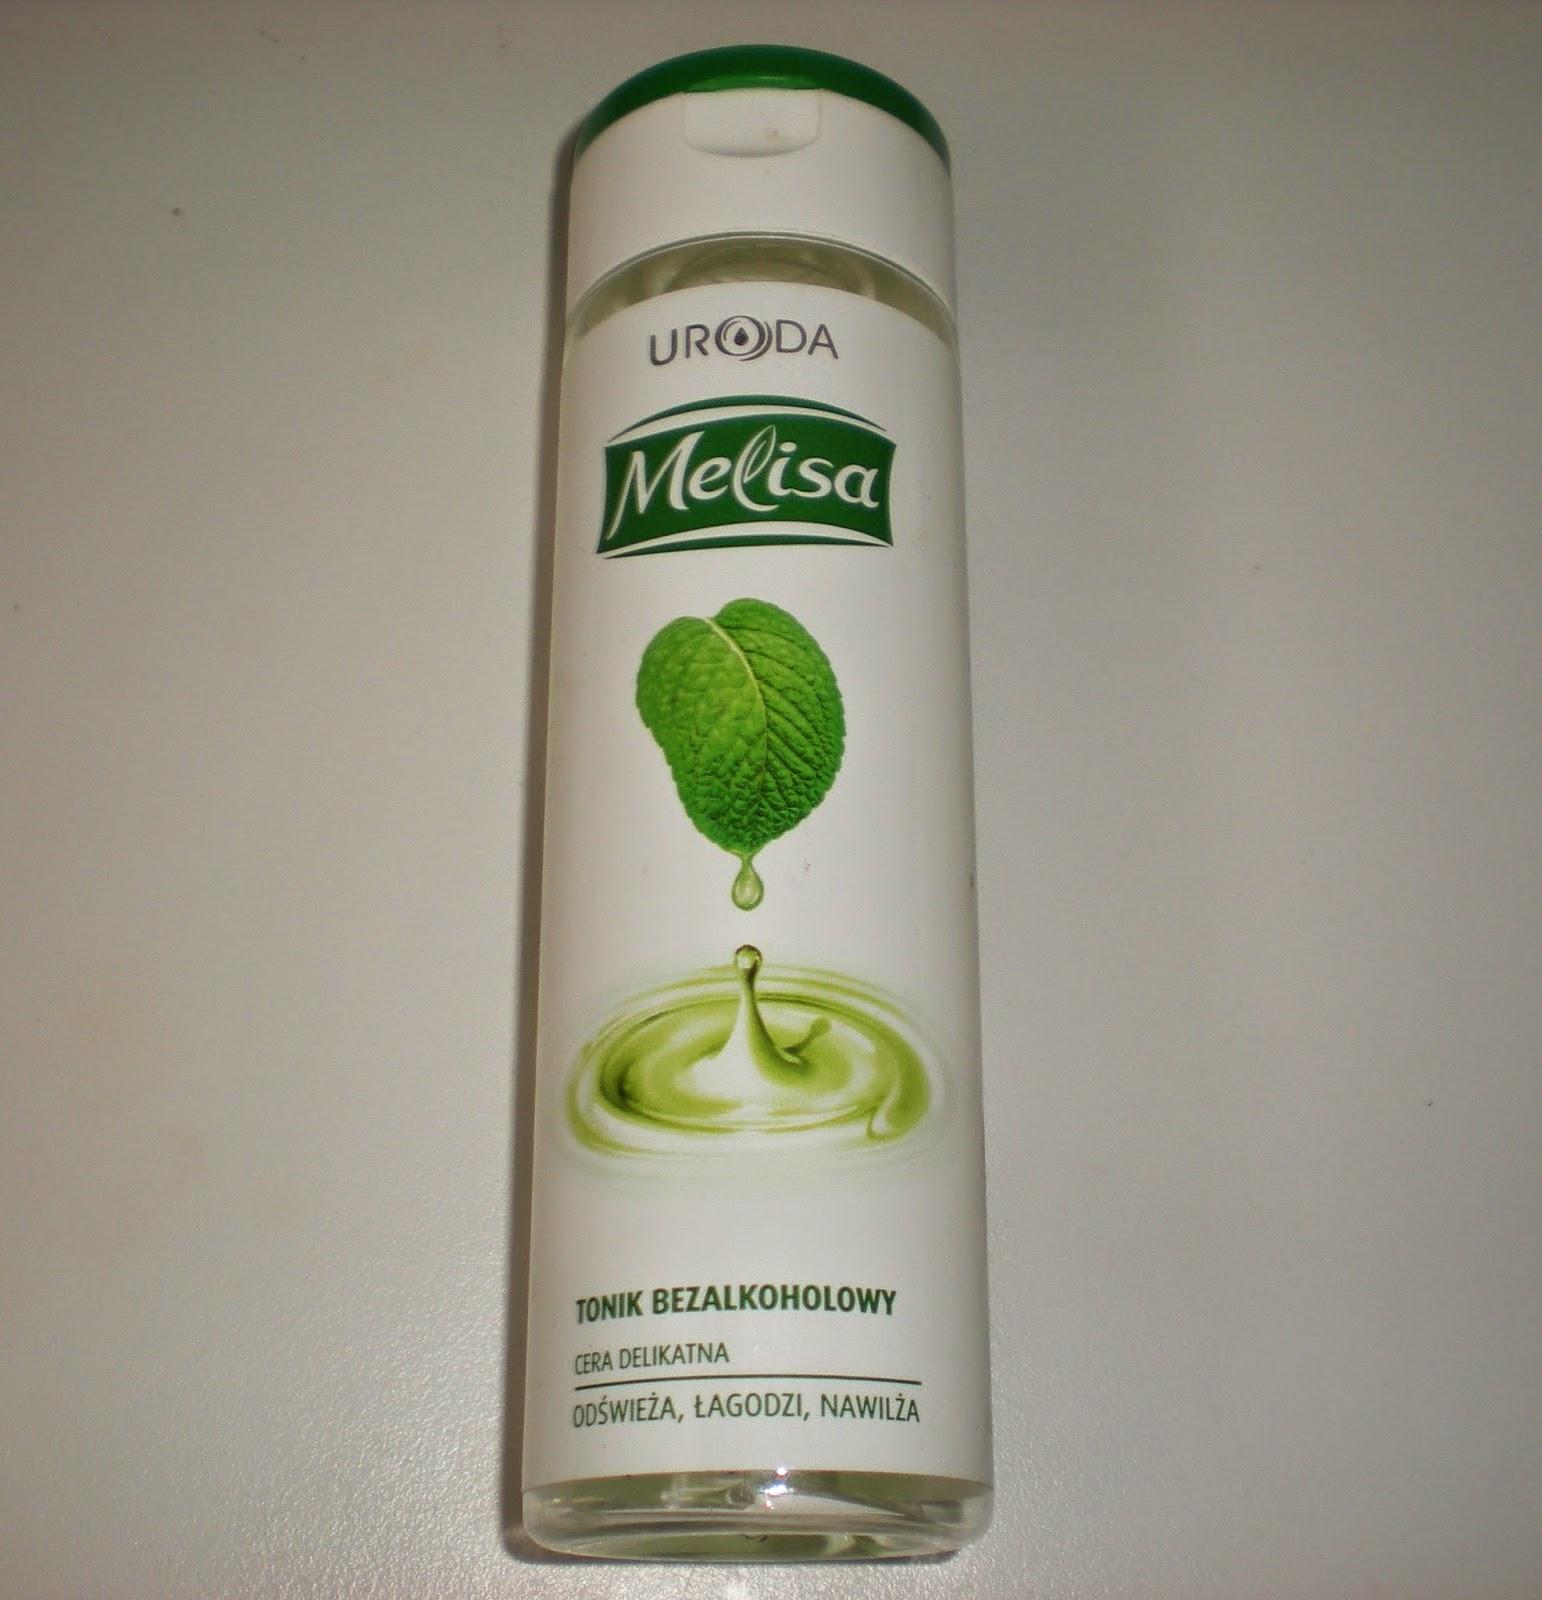 Tonik bezalkoholowy Melisa, Uroda